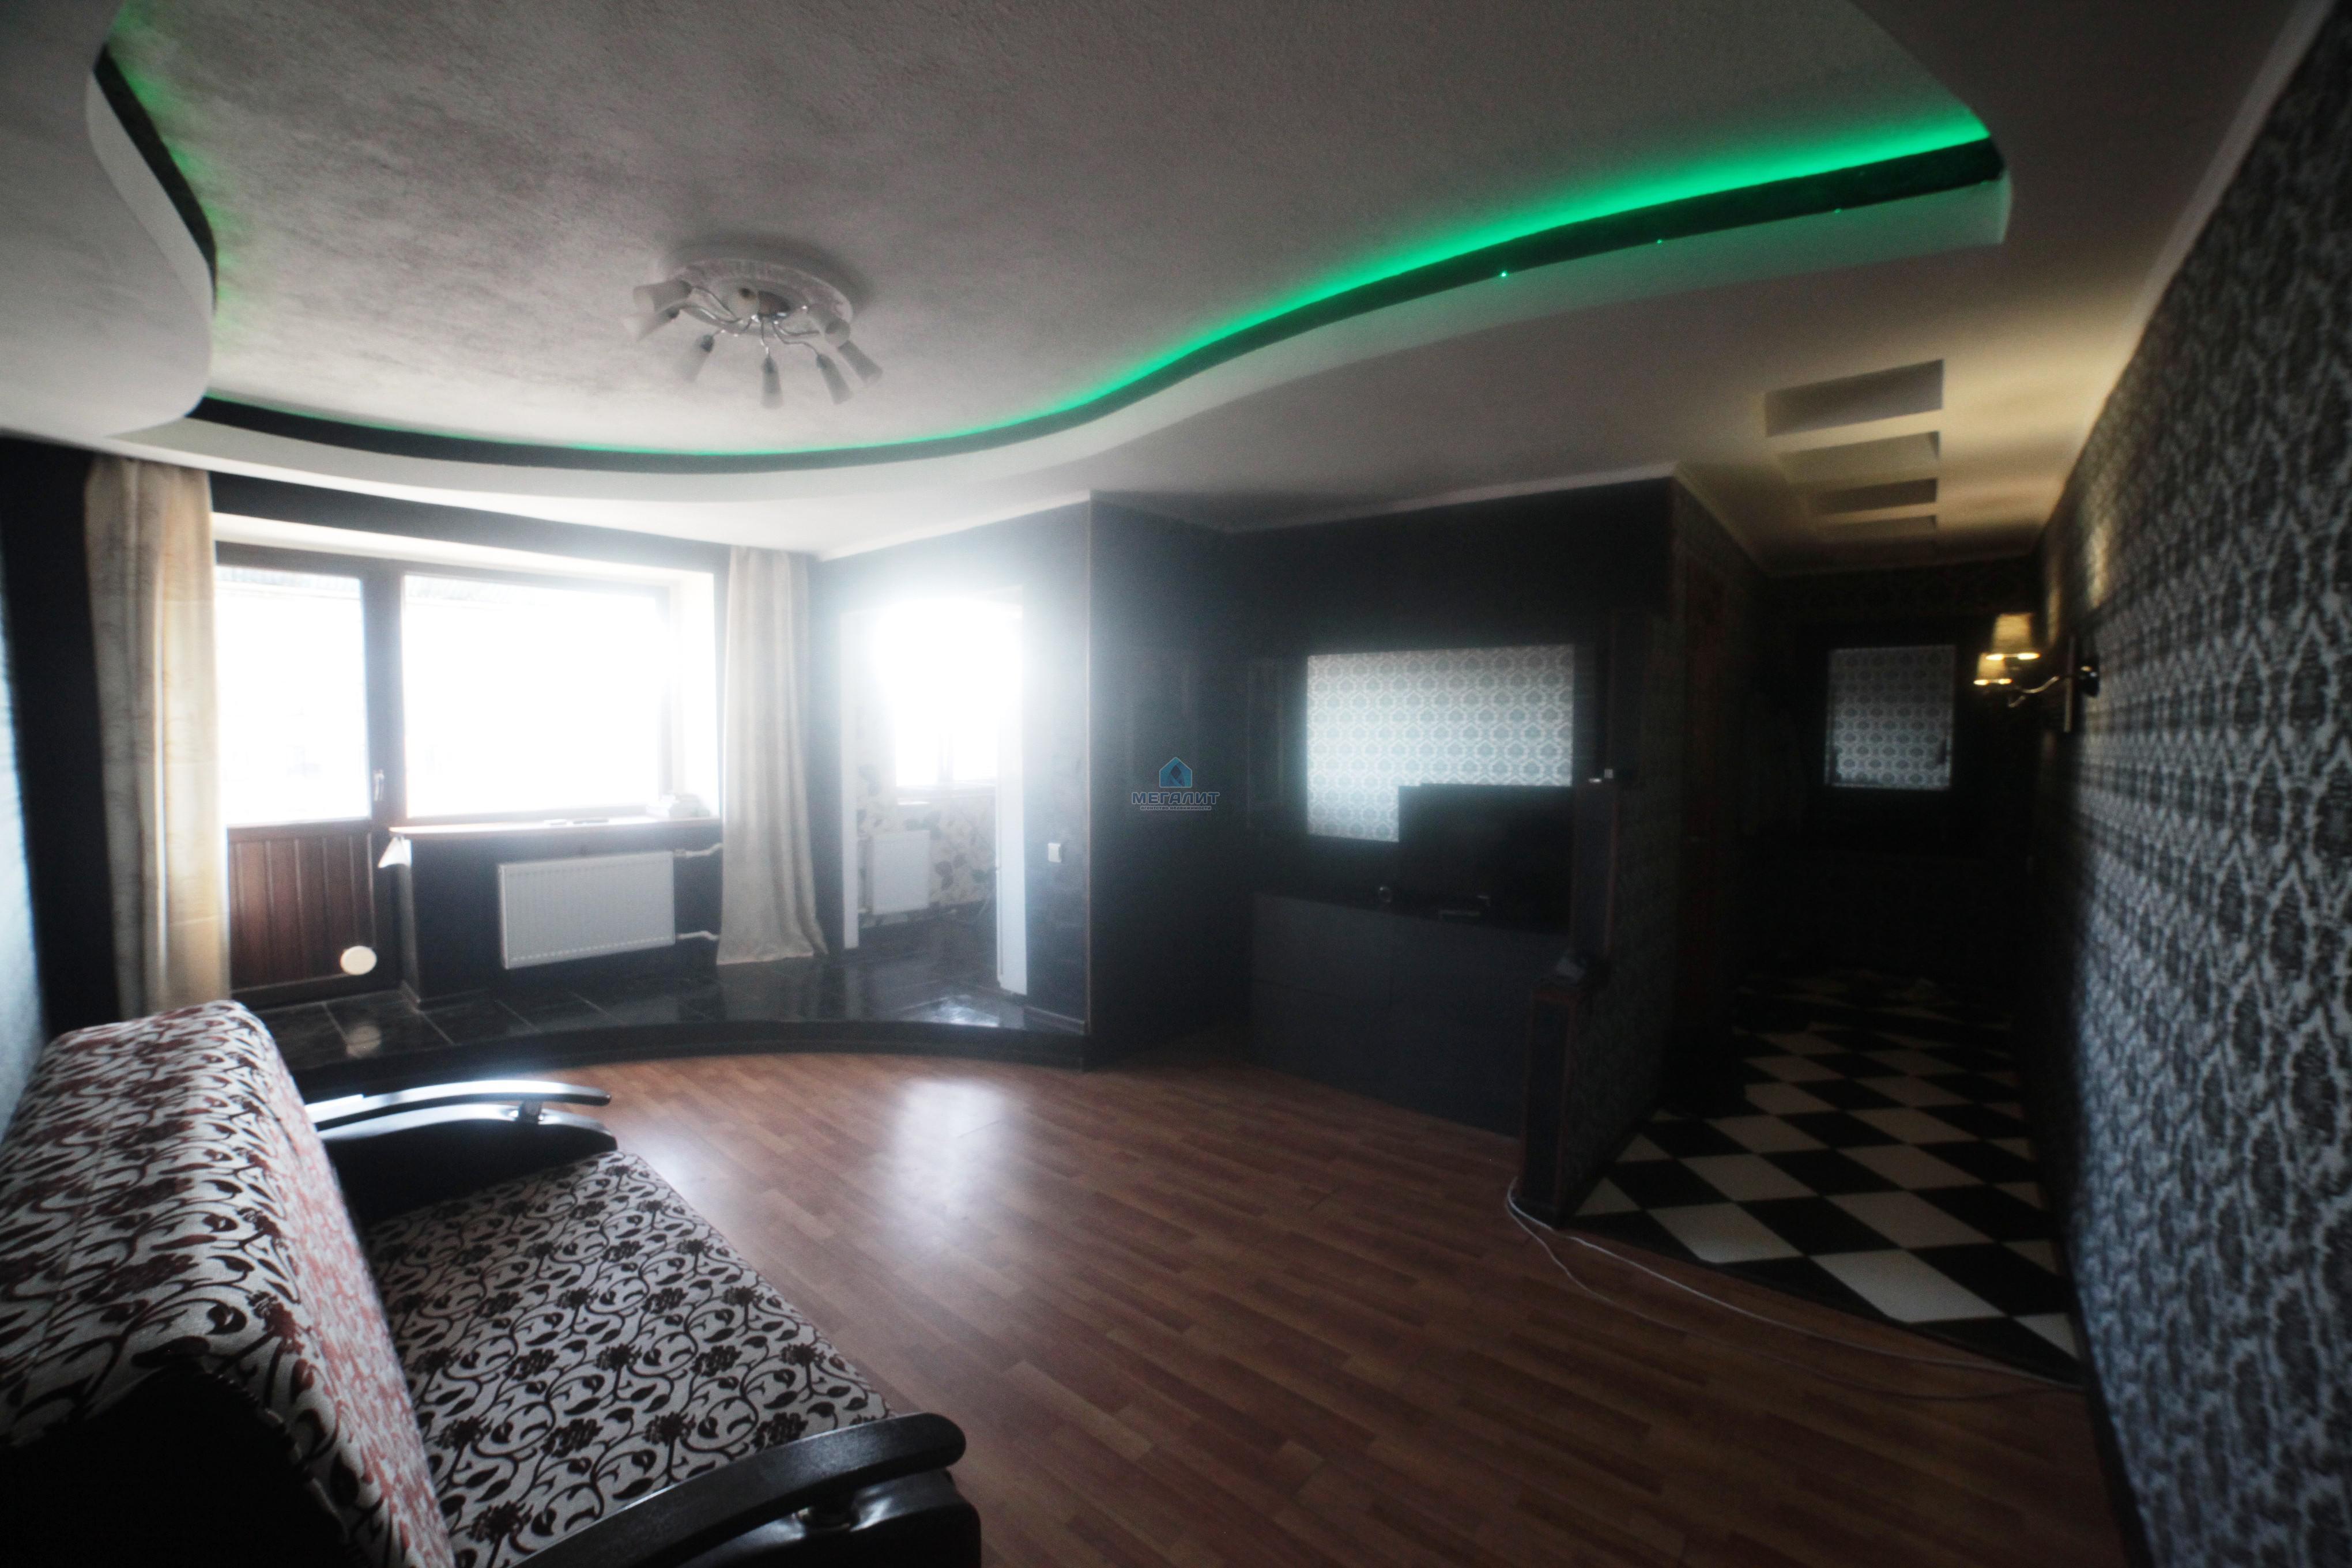 Аренда 1-к квартиры Волгоградская 12, 33.0 м² (миниатюра №1)